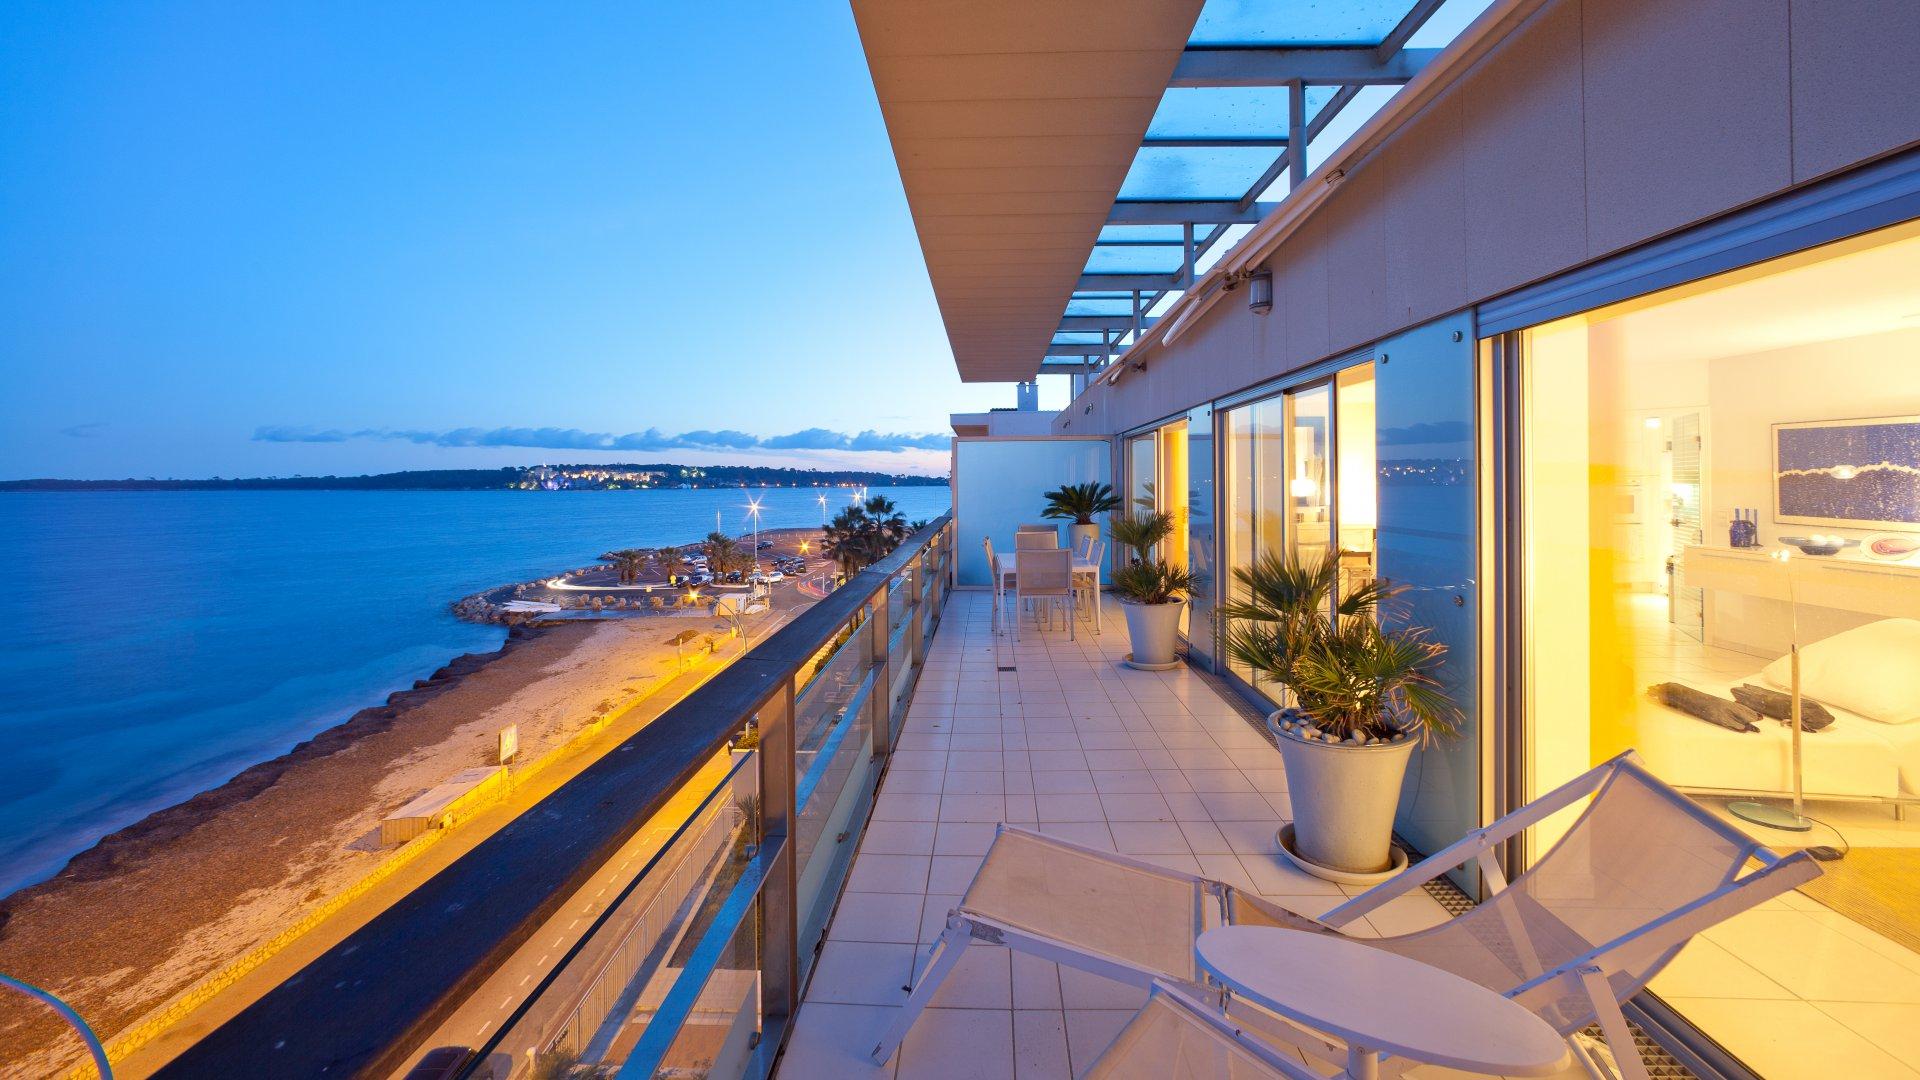 annonce location saisonni re appartement cannes palm beach 06400 6 couchages ref l0524ca. Black Bedroom Furniture Sets. Home Design Ideas